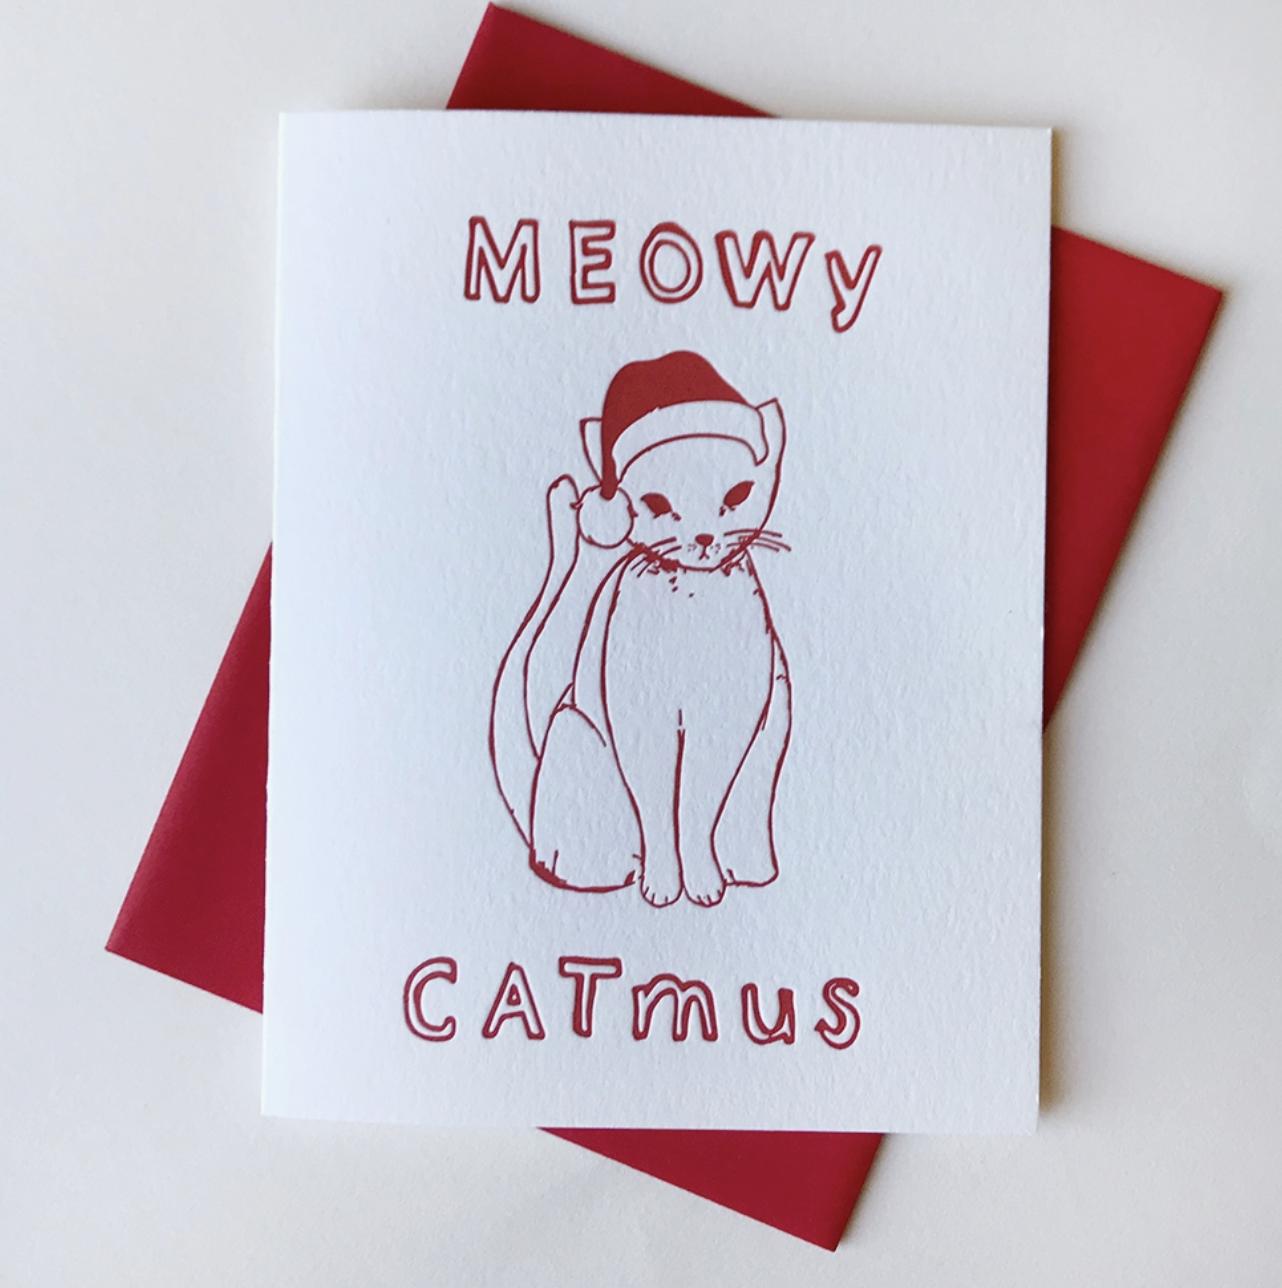 Steel Petal Press Meowy Catmus